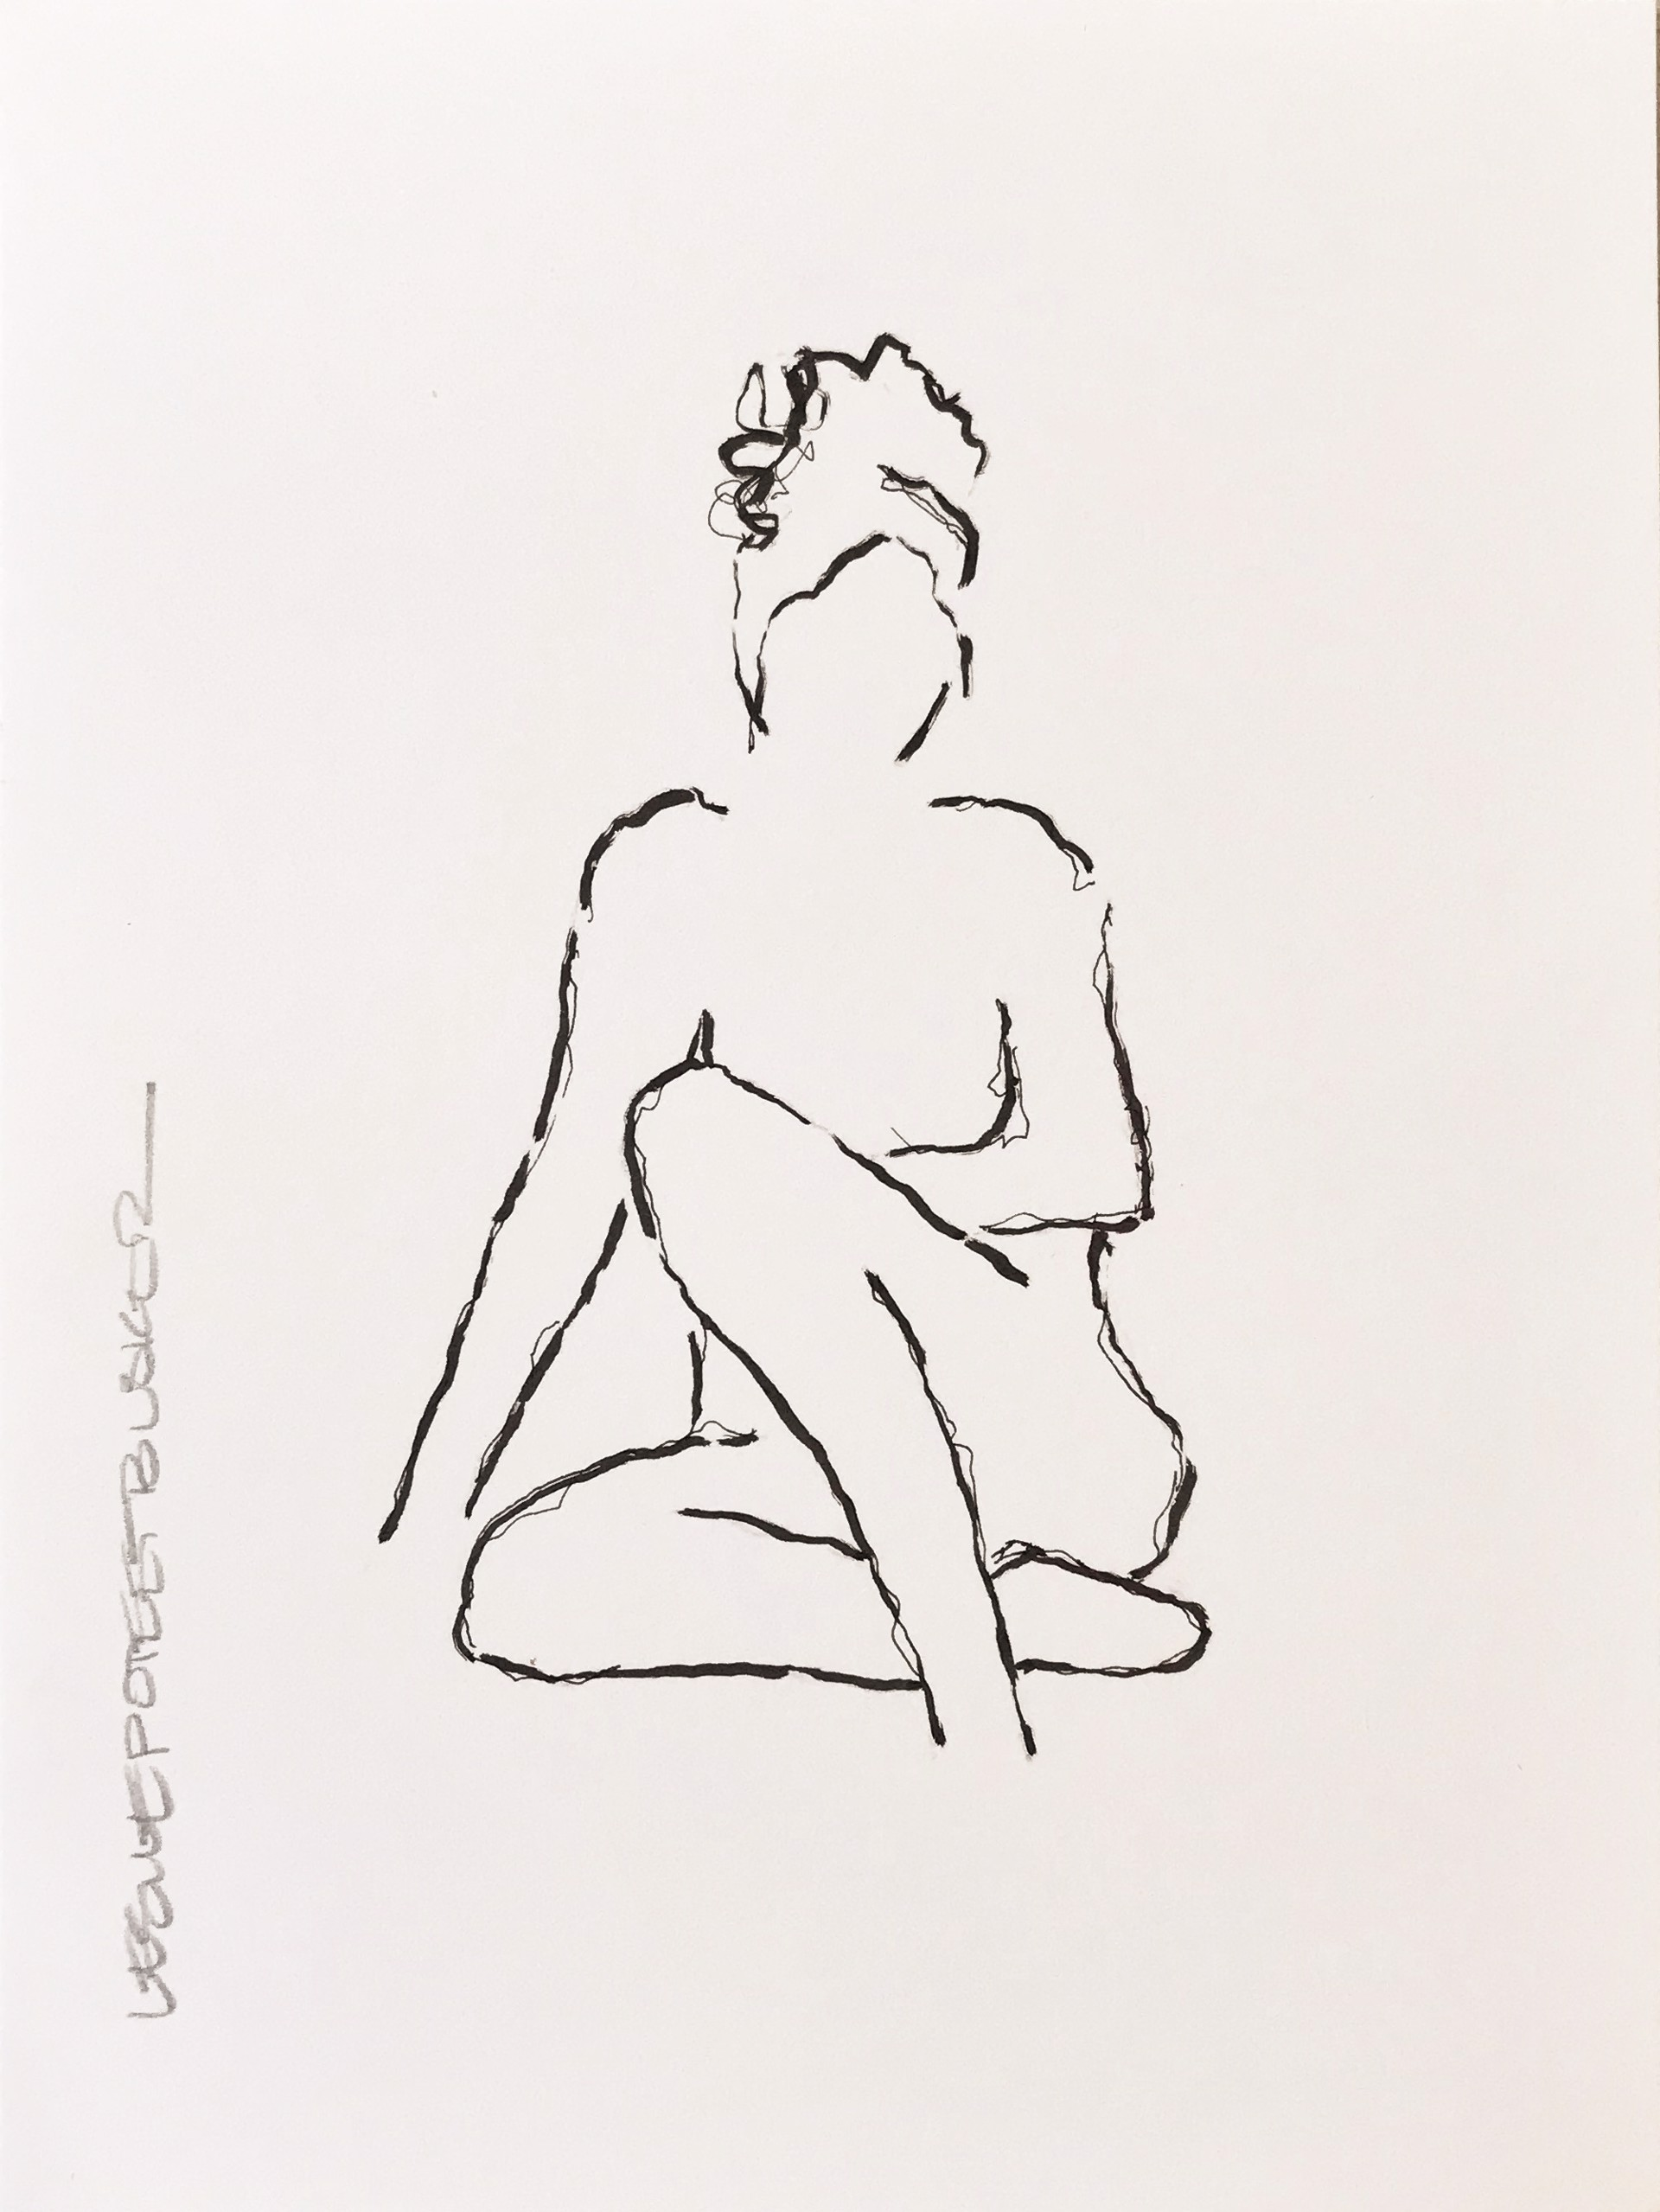 Figure No. 82 by Leslie Poteet Busker